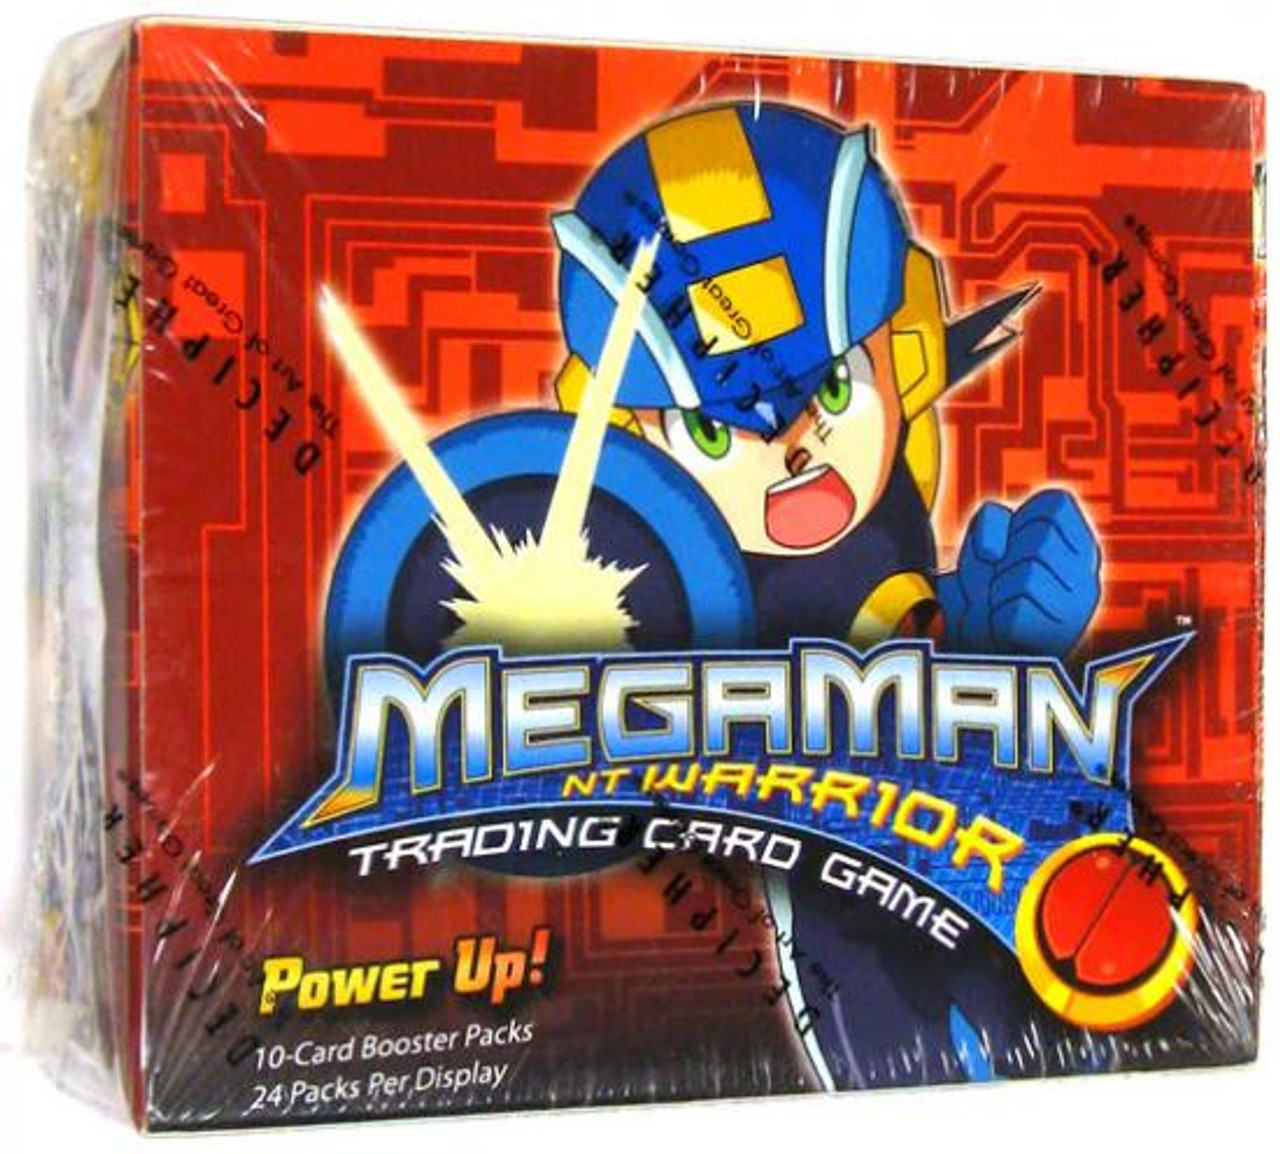 Mega Man NT Warrior Power Up! Booster Box [24 Packs]